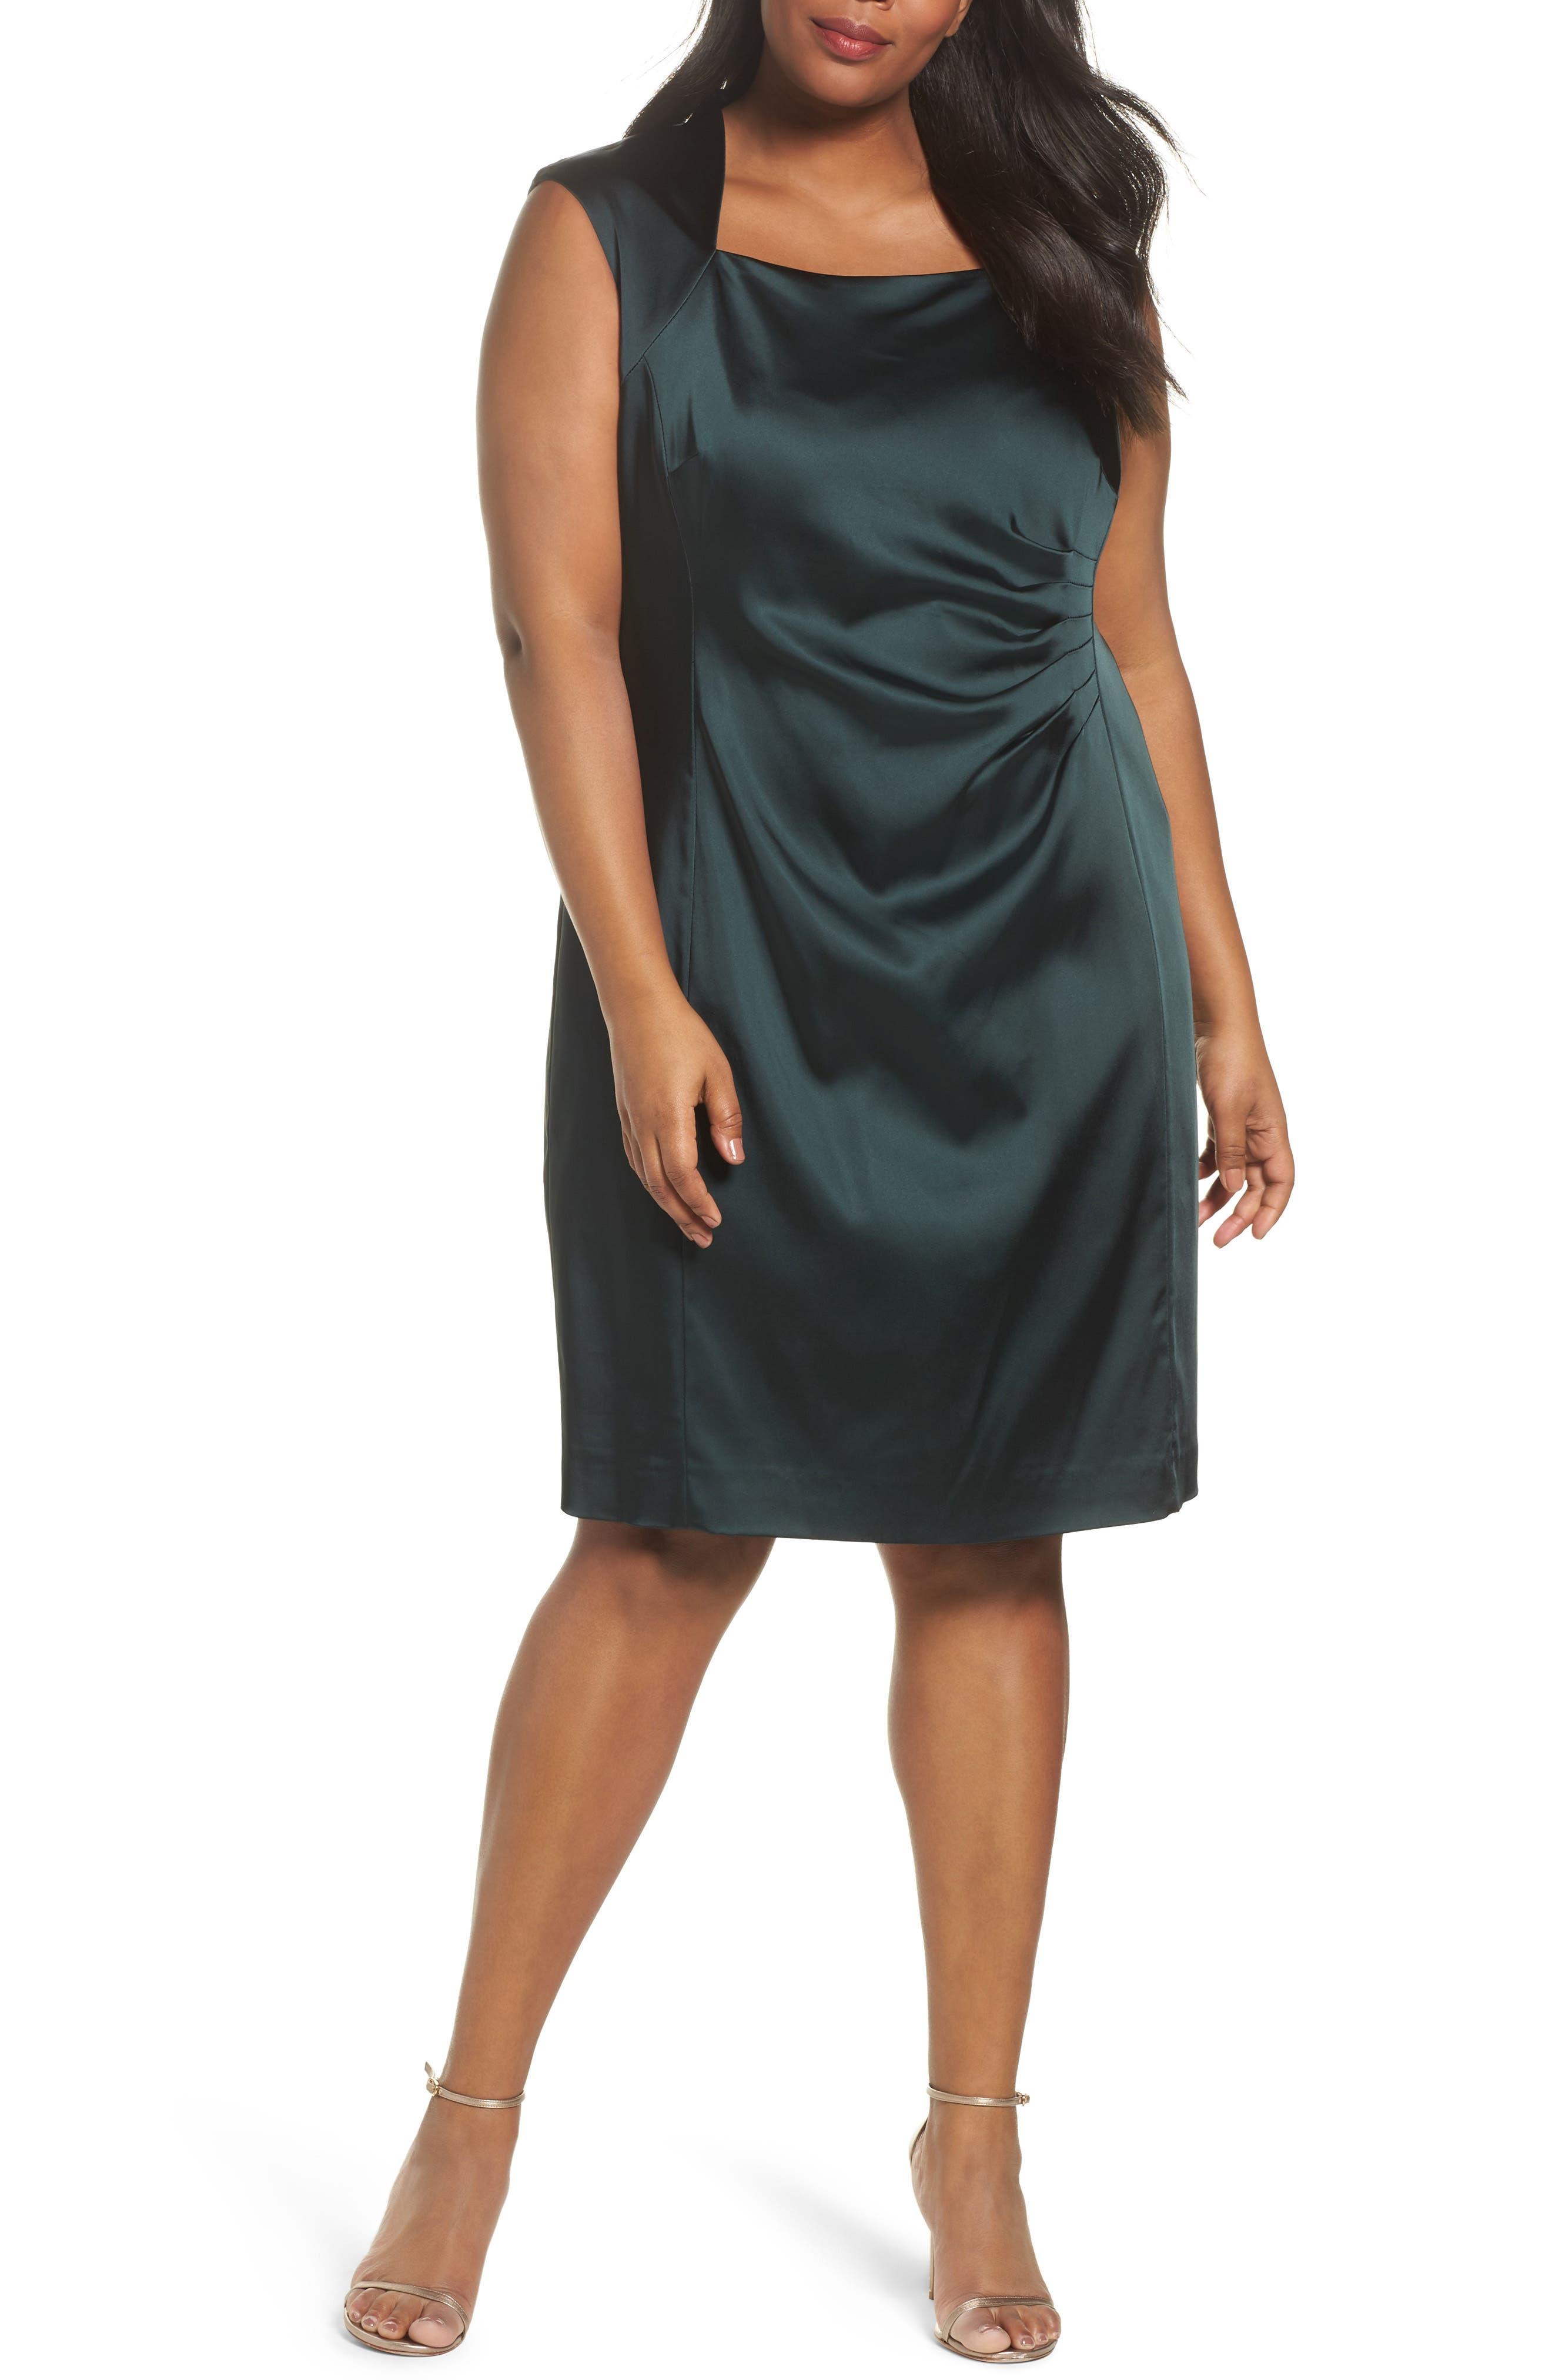 Alternate Image 1 Selected - Tahari Side Pleat Satin Sheath Dress (Plus Size)